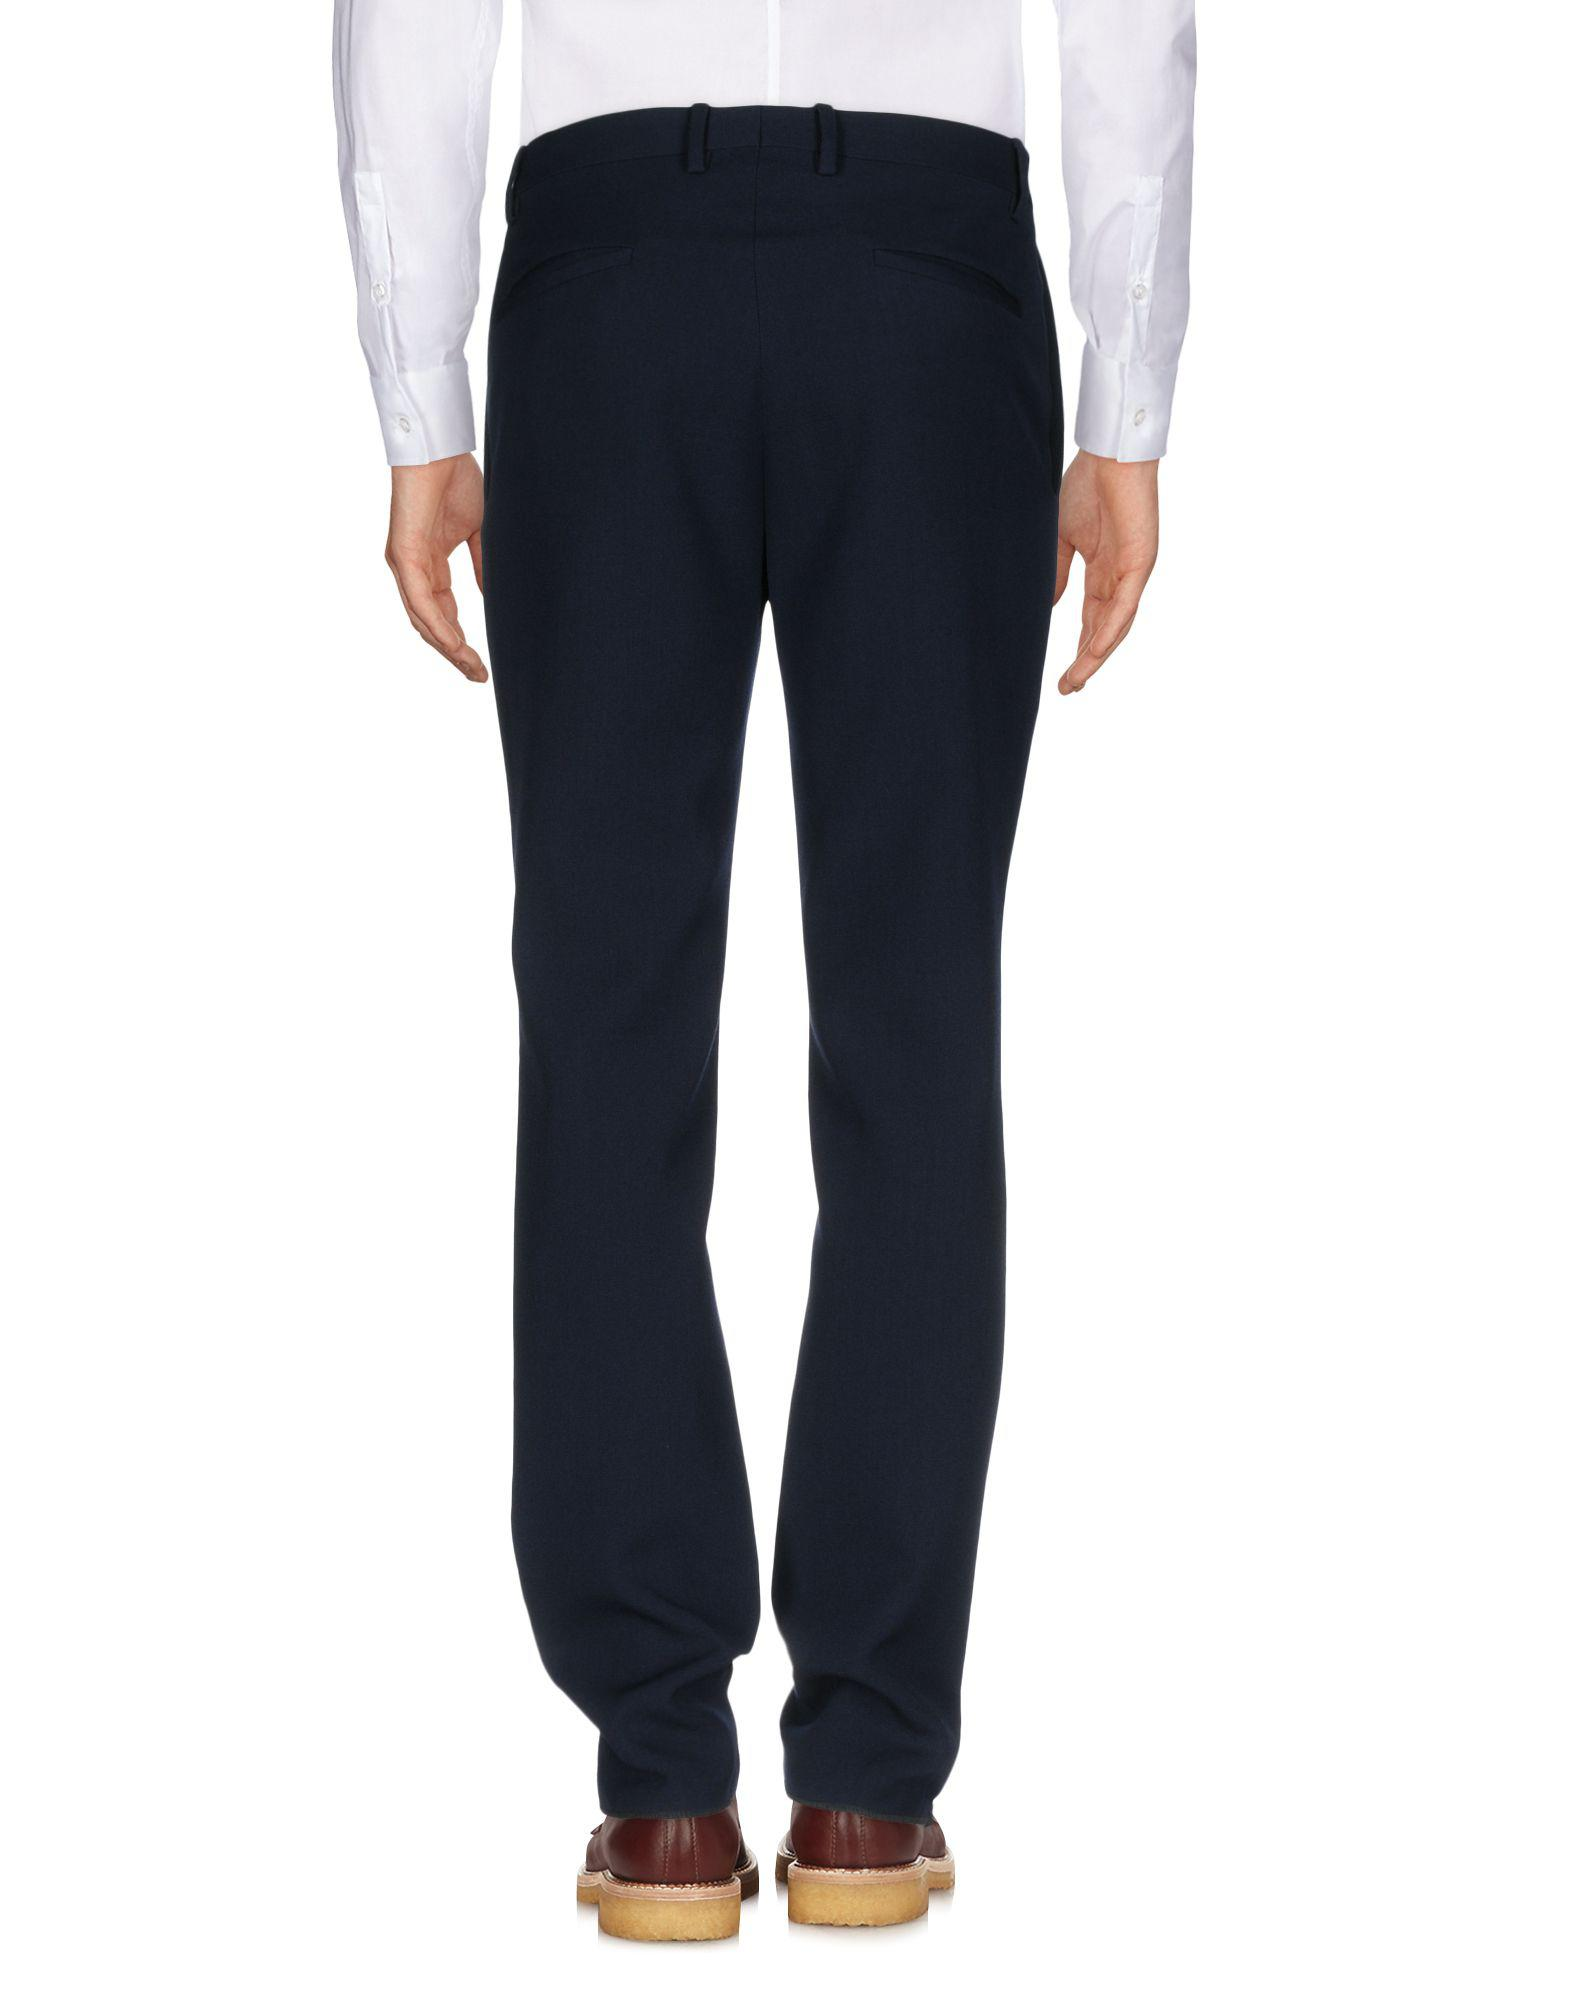 Umit Benan Wool Casual Pants in Dark Blue (Blue) for Men